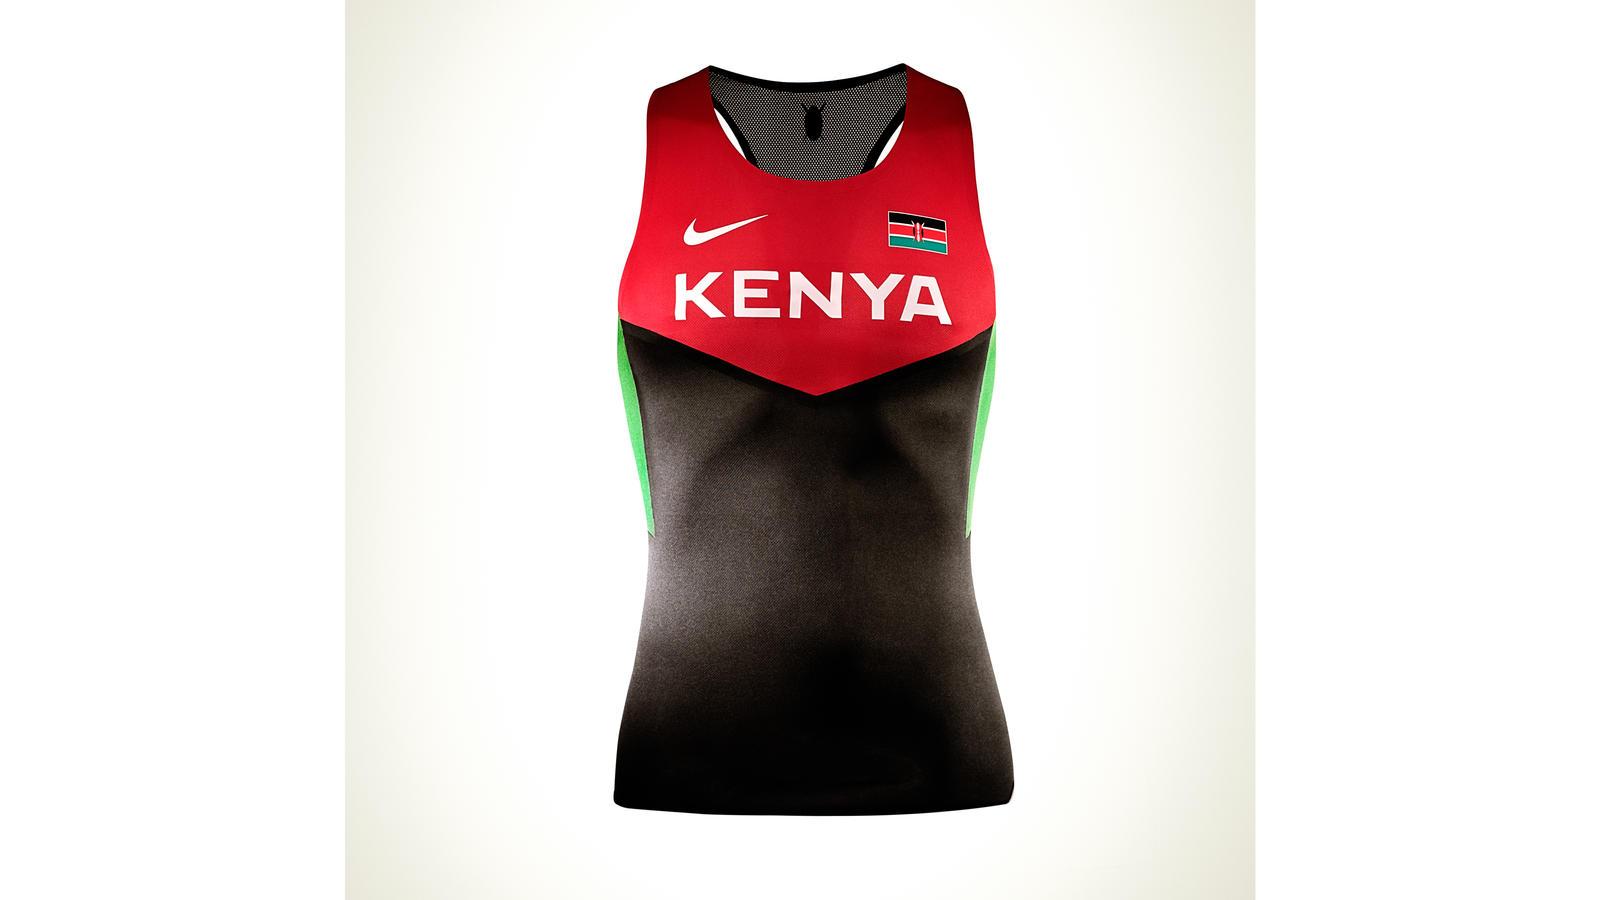 Nike Innovative Kenyan Of Uniform To Wear Champion Marathon wCxFOCqZ